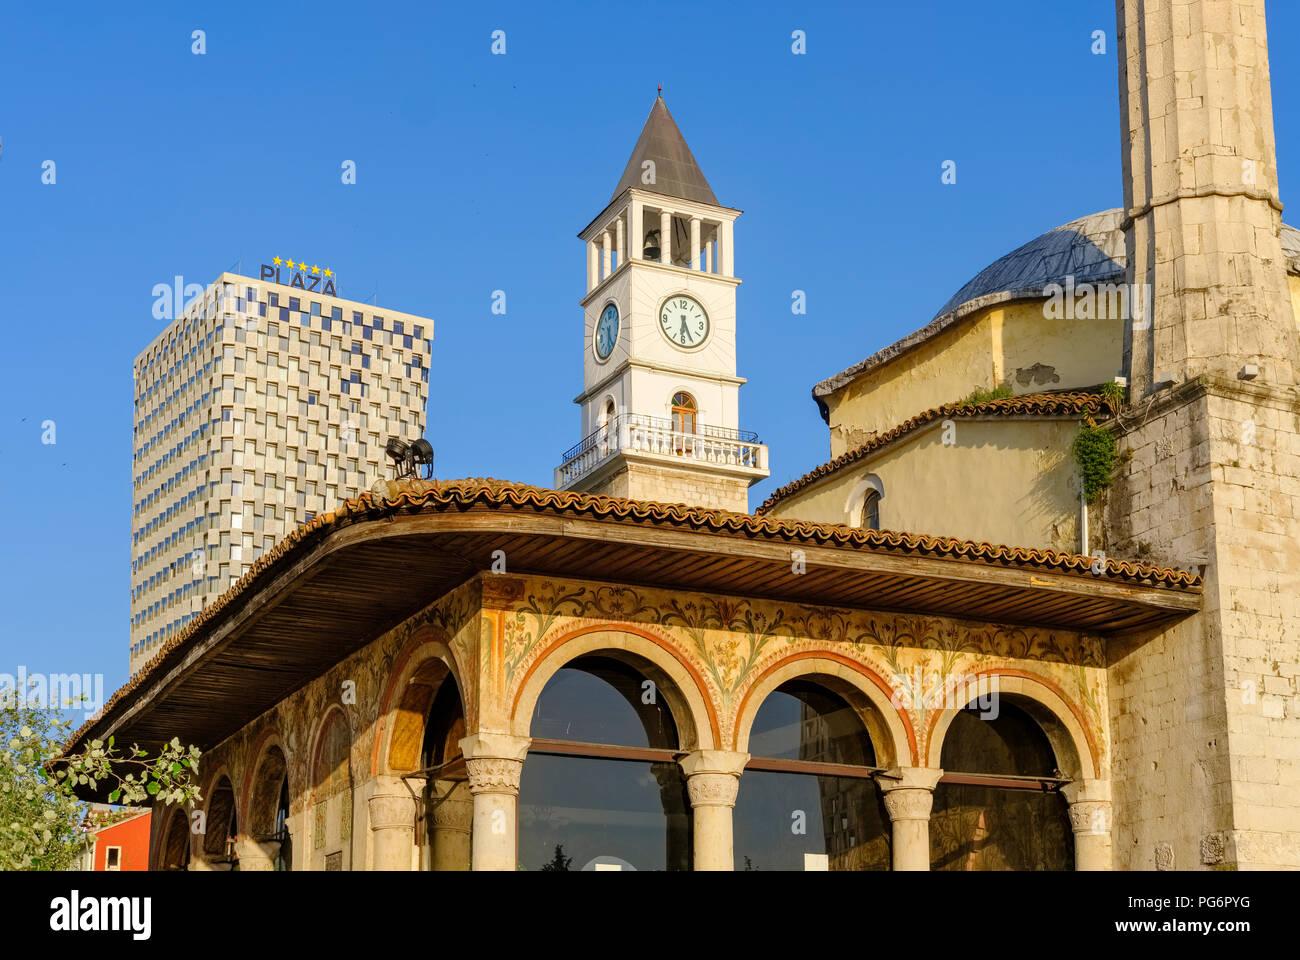 Albania, Tirana, TID Tower, Clock Tower, Et'hem Bey Mosque - Stock Image